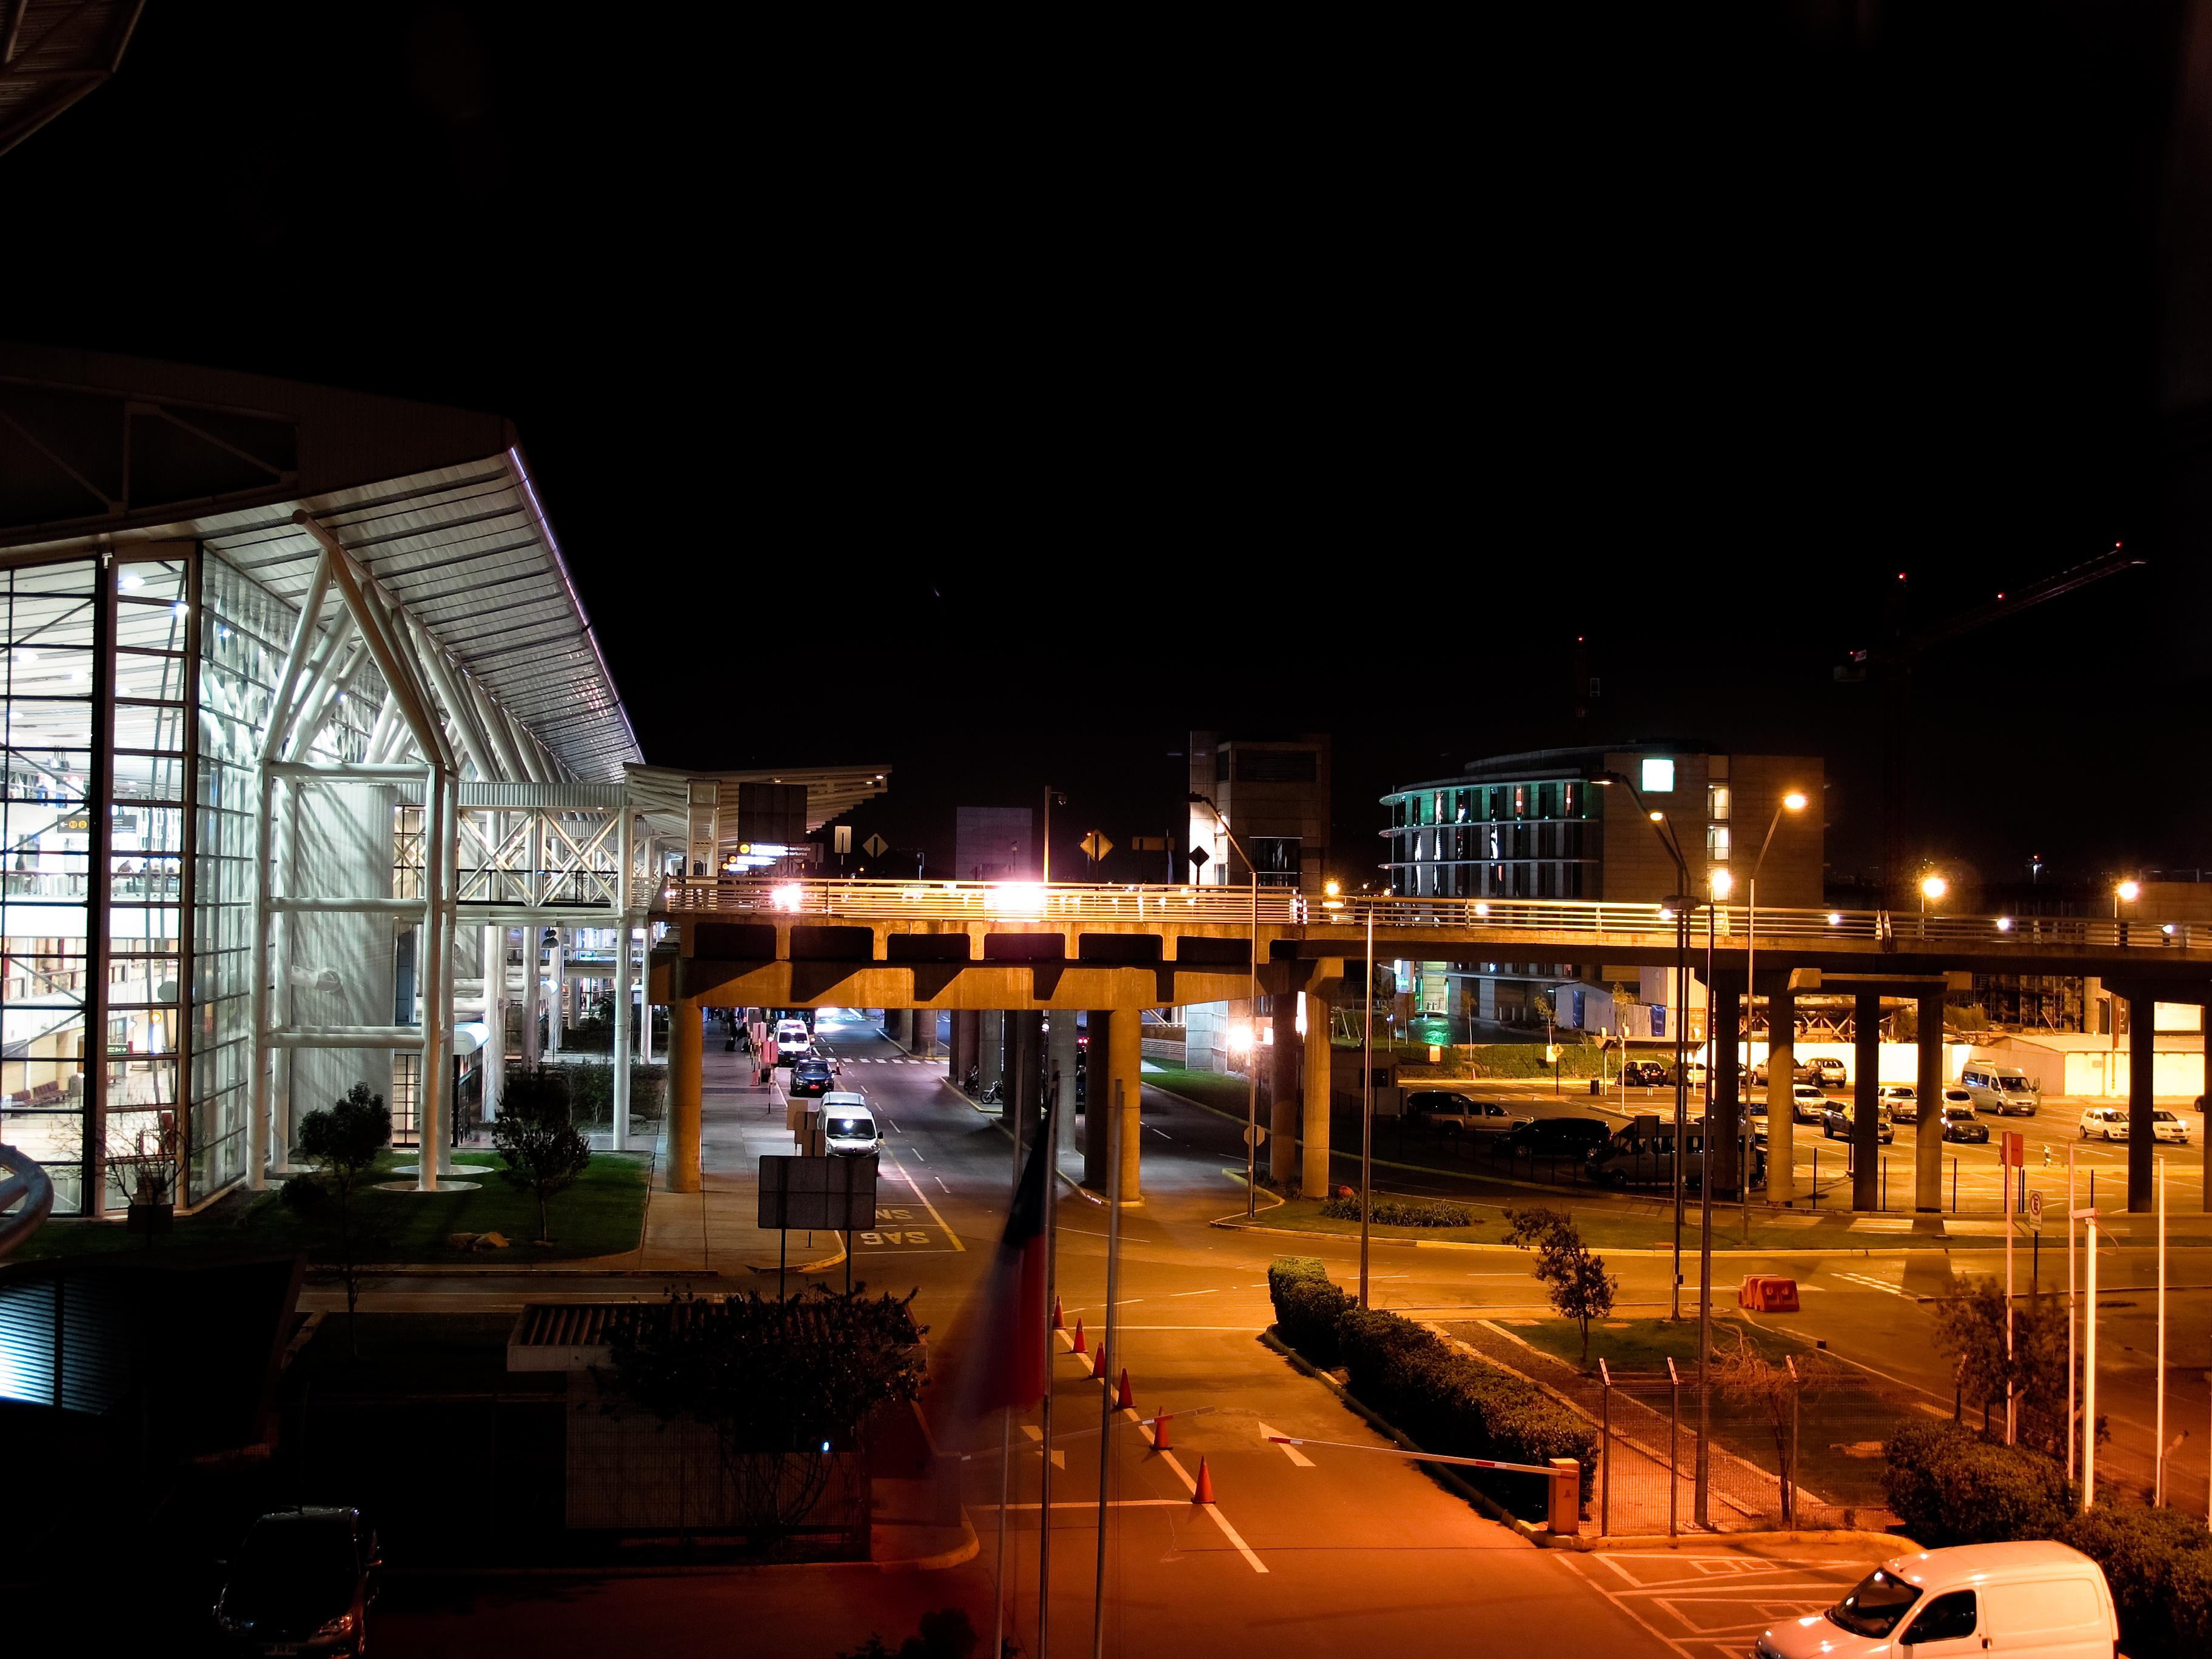 Aeropuerto de Santiago Arturo Merino Benítez